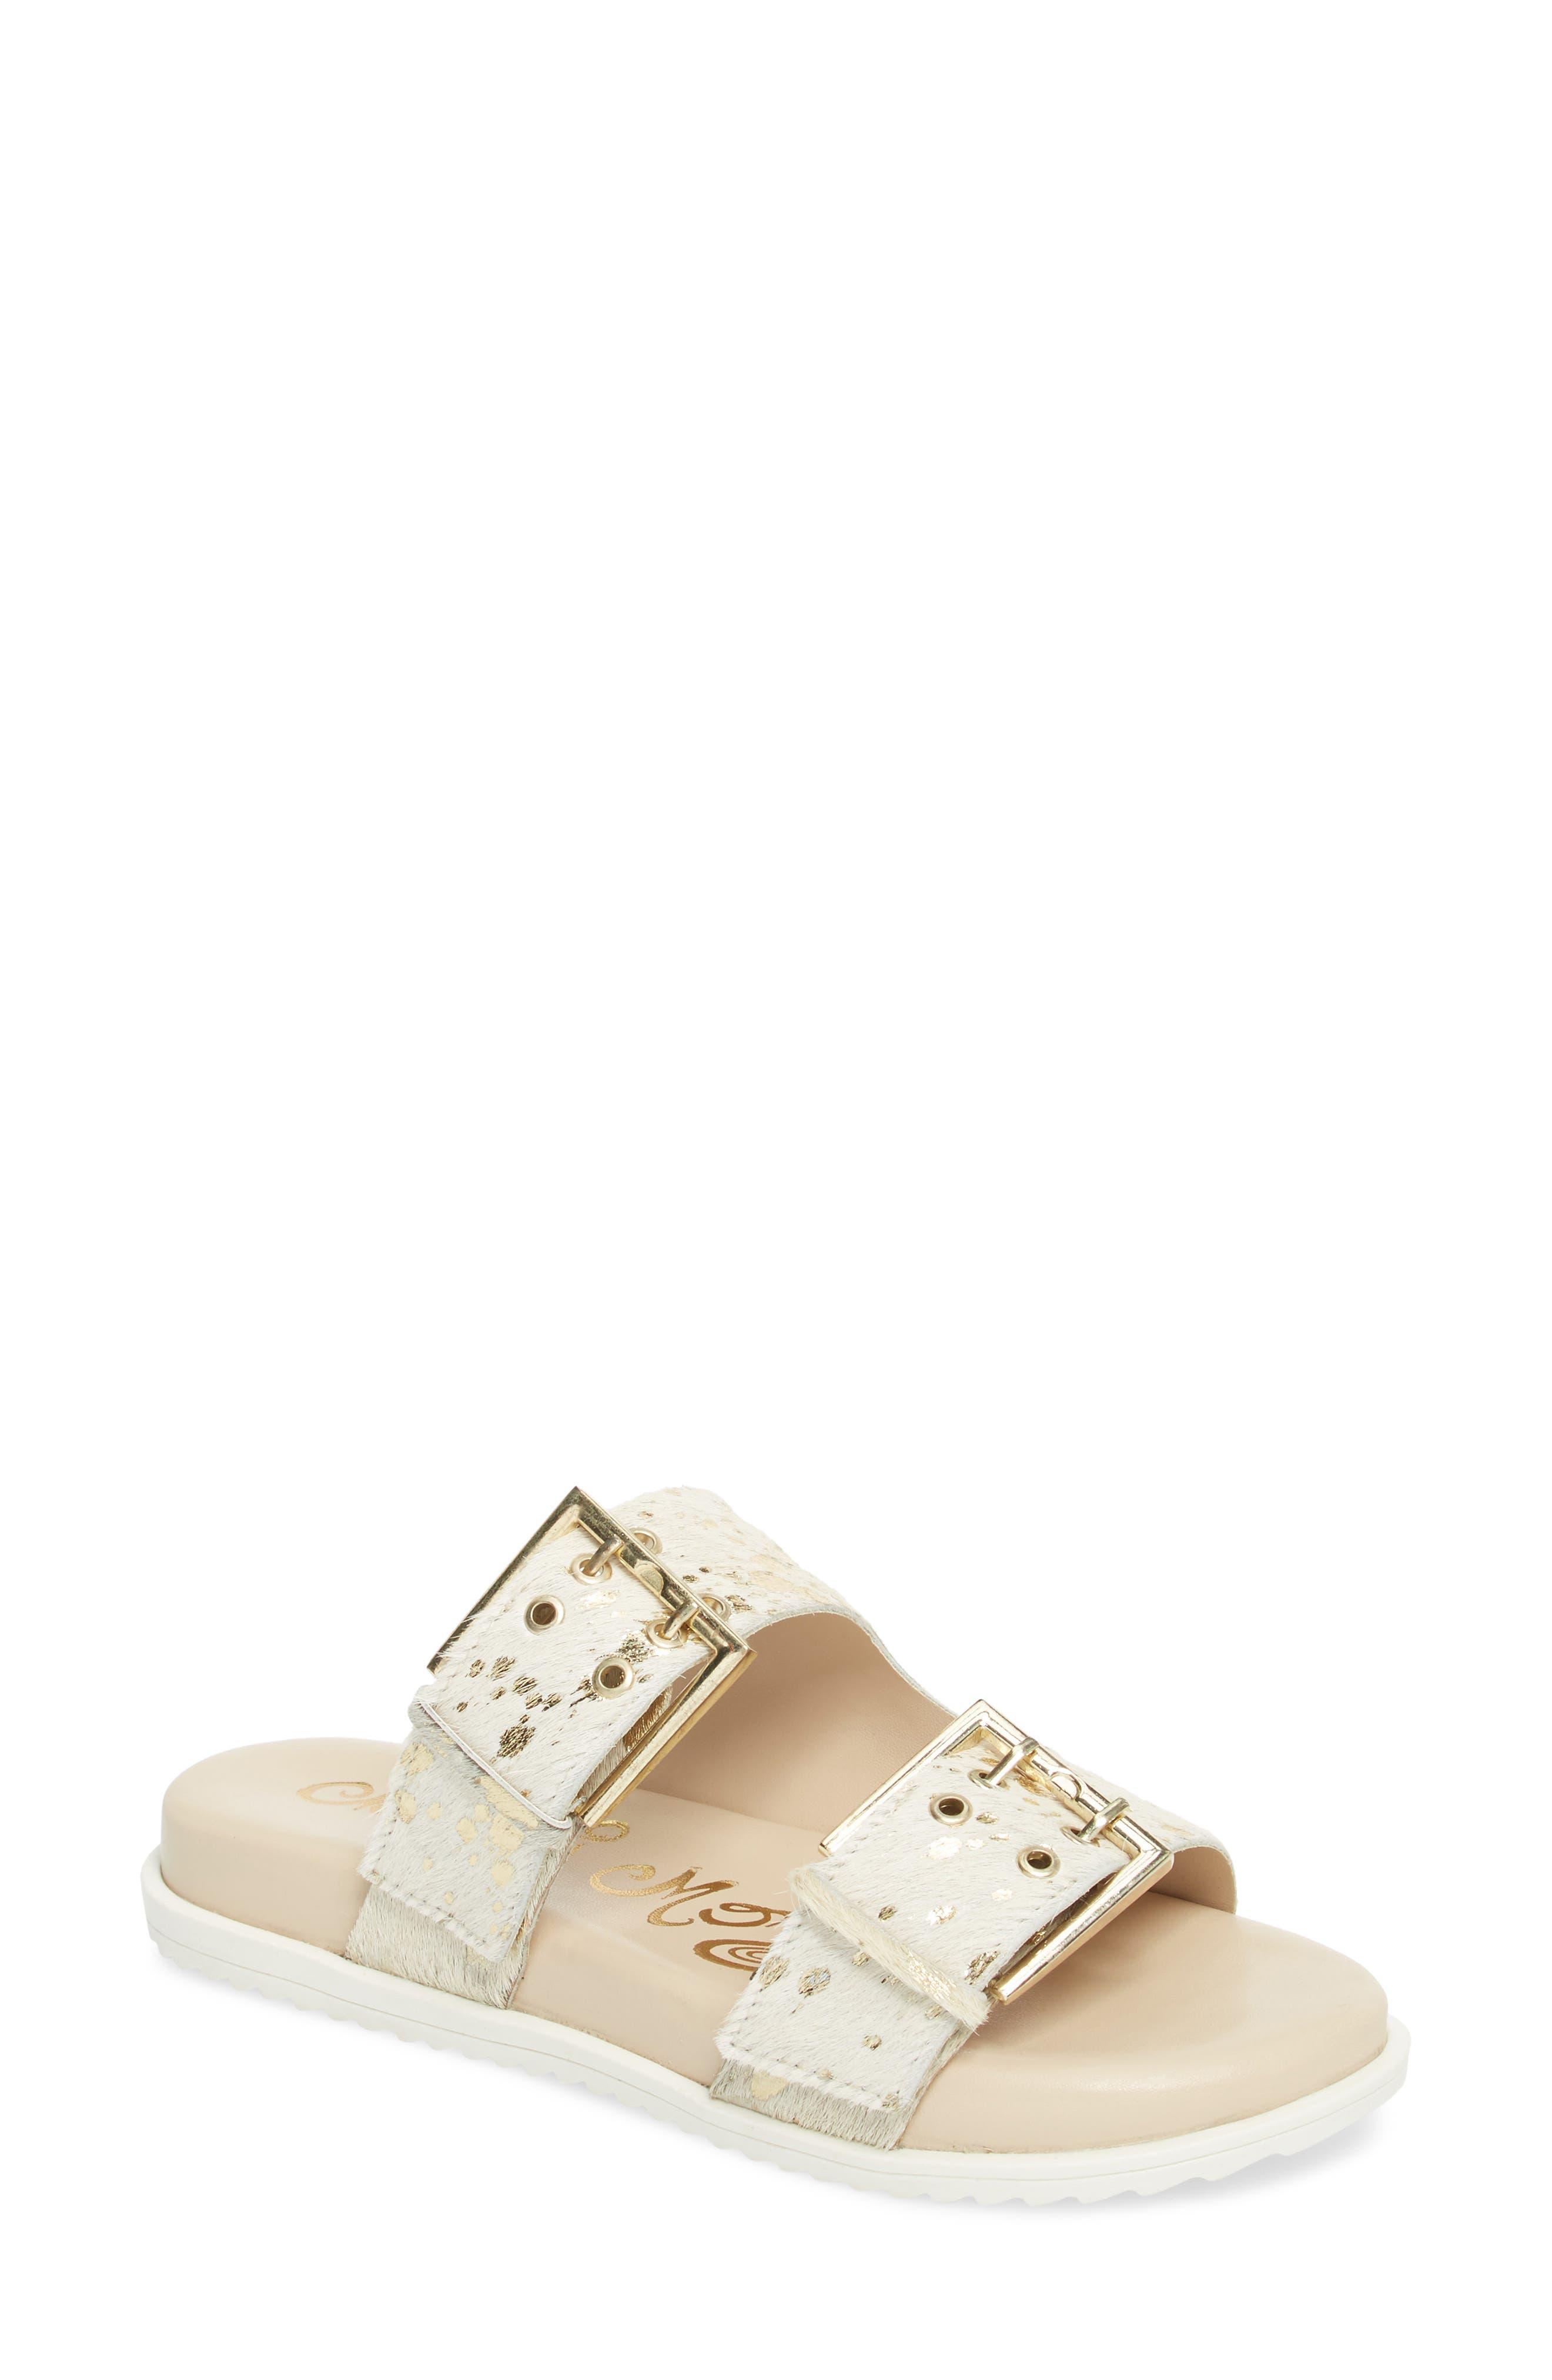 Genuine Calf Hair Double Strap Sandal,                         Main,                         color,